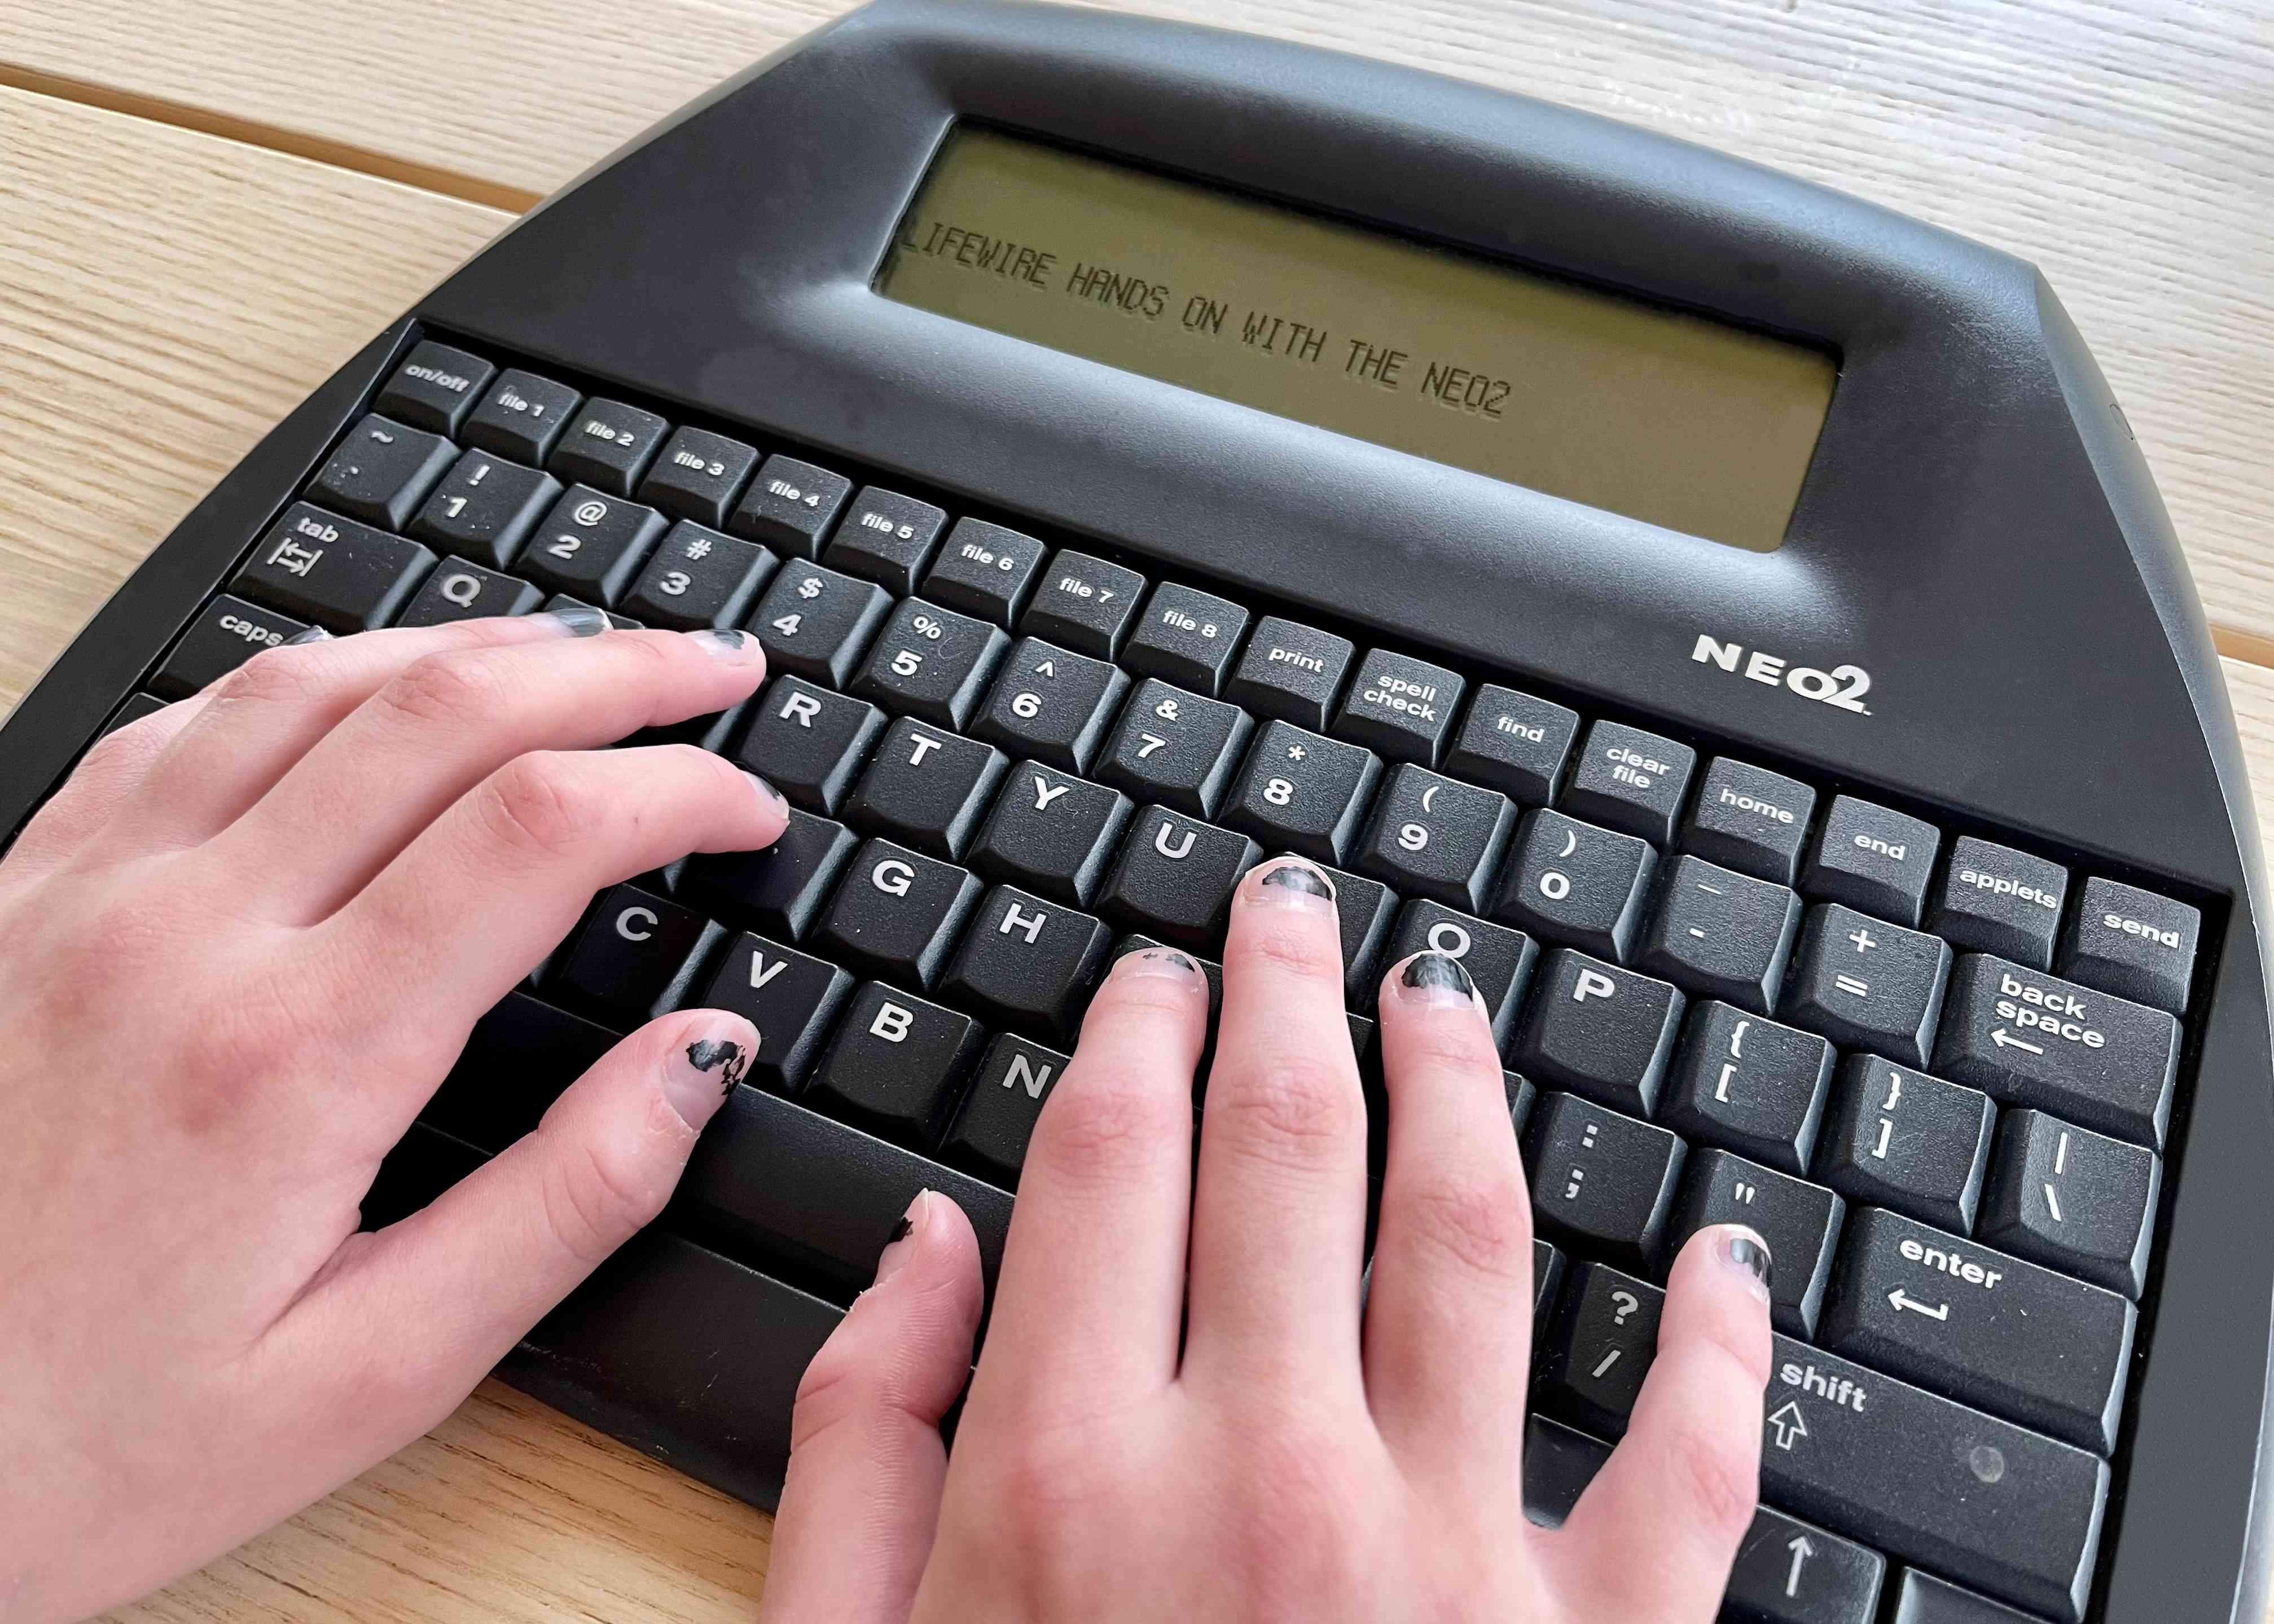 The Alphasmart Neo 2 word processor.